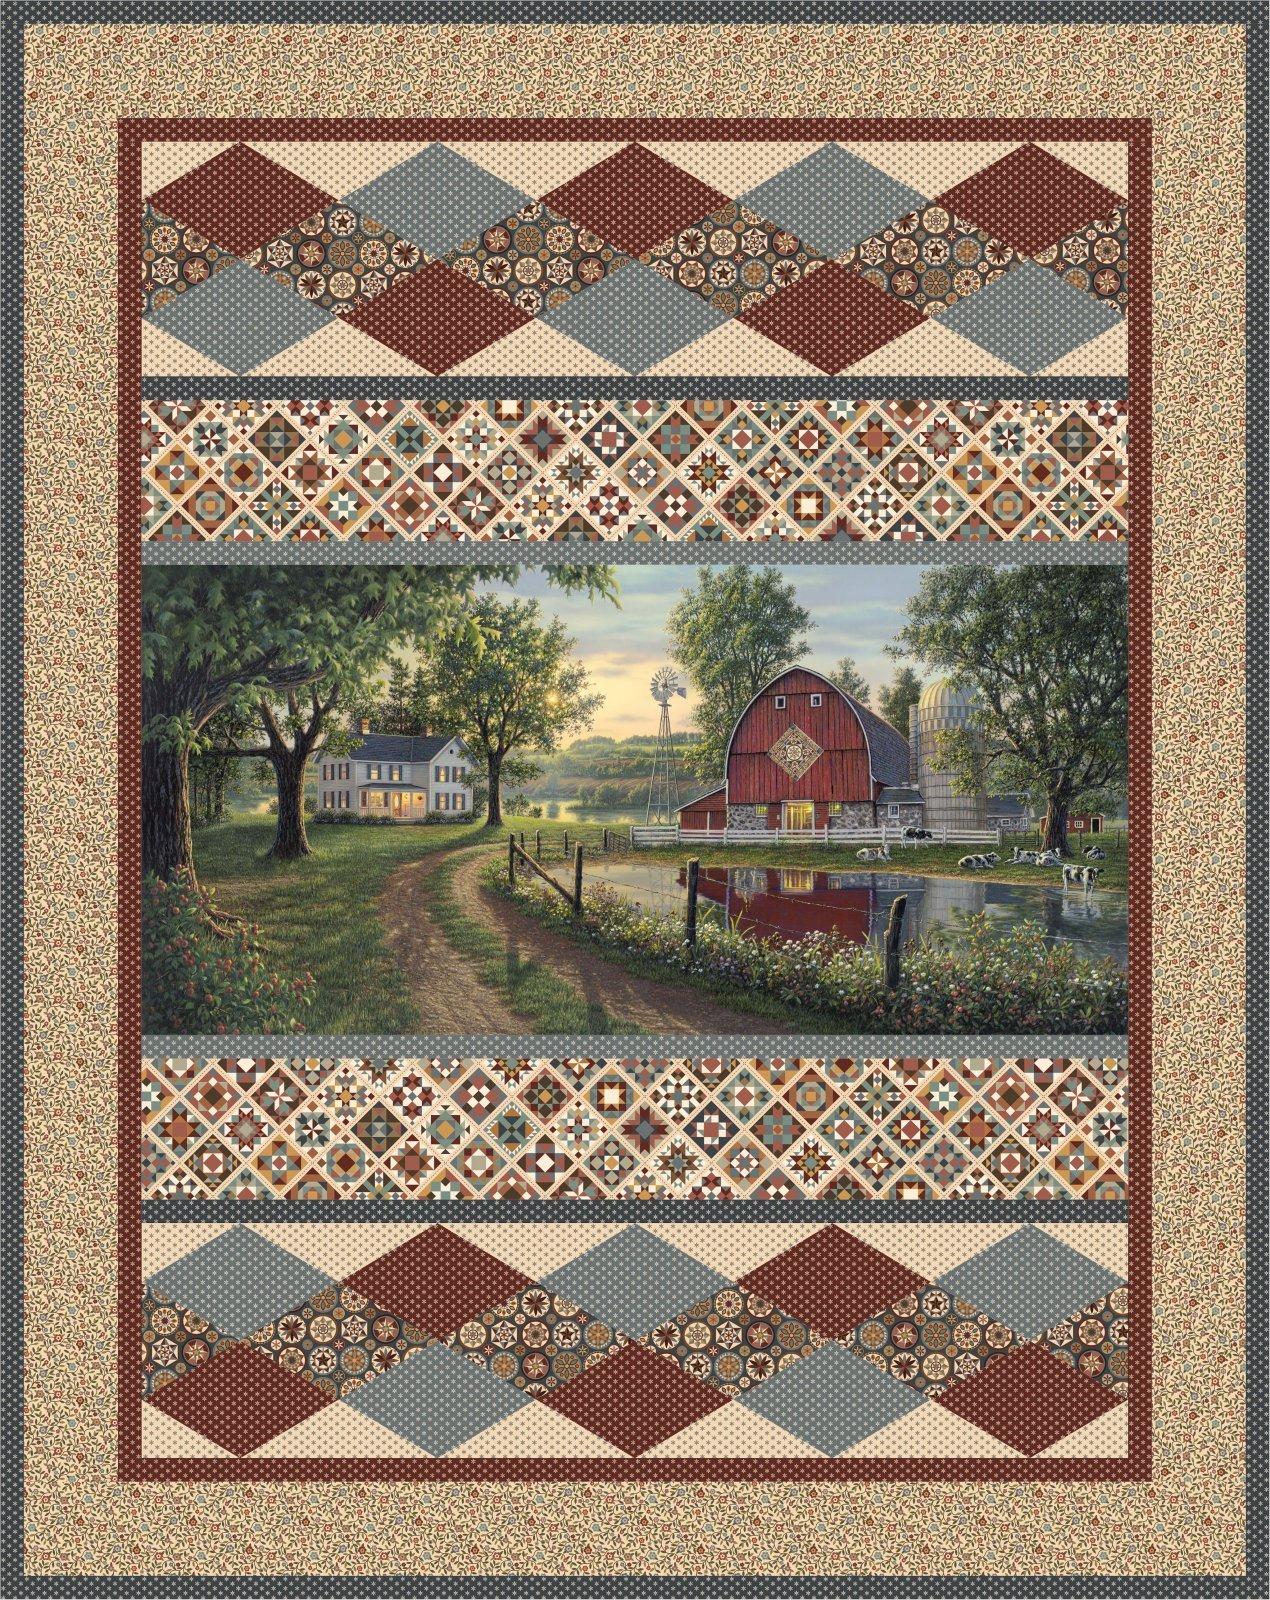 Mosaic Farm